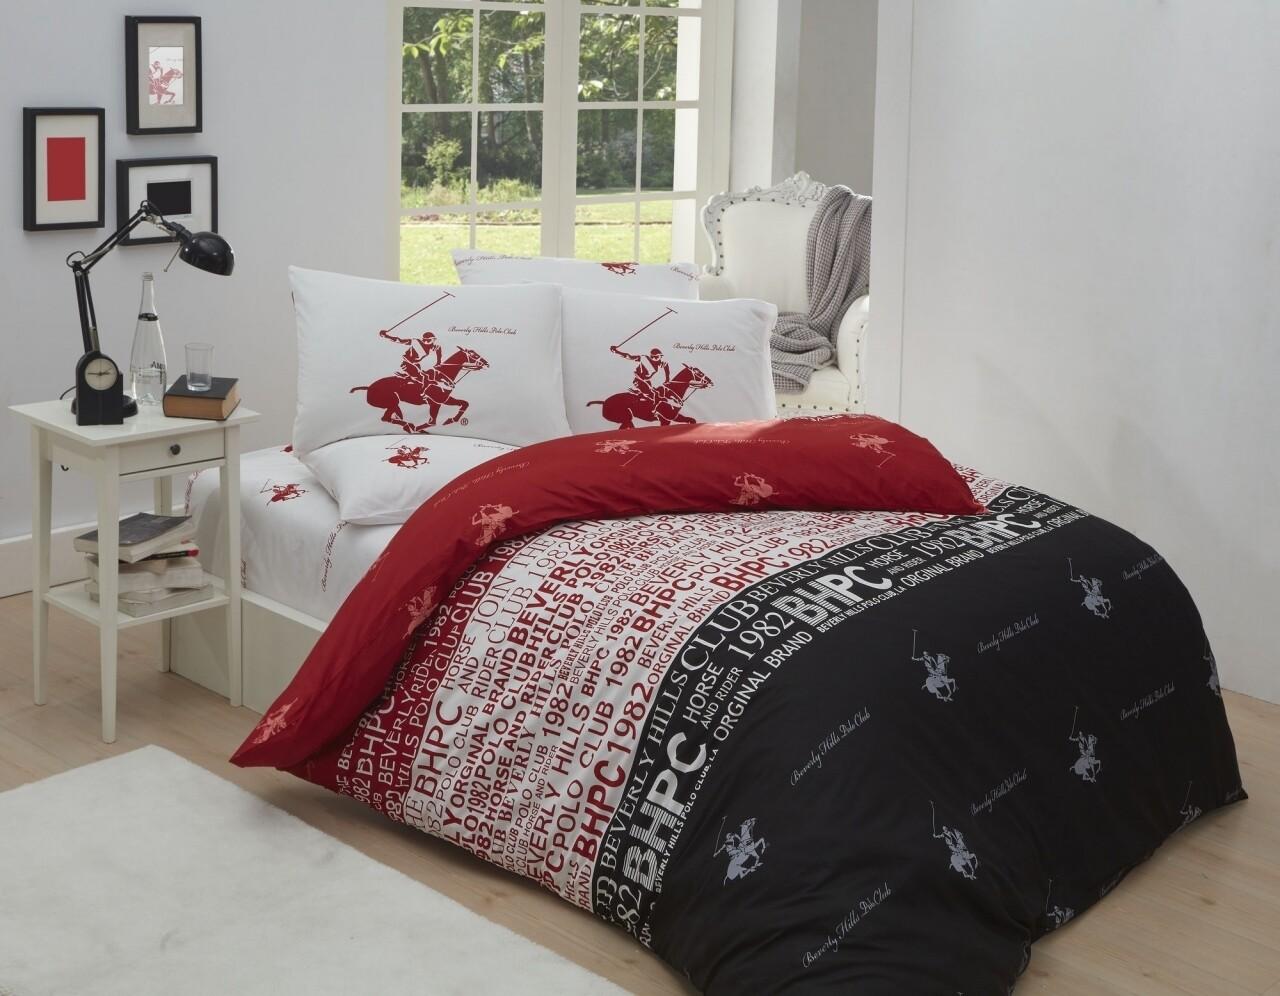 Lenjerie de pat dubla Black & Red, Beverly Hills Polo Club, 4 piese, 240 x 260 cm, 100% bumbac ranforce, rosu/alb/negru